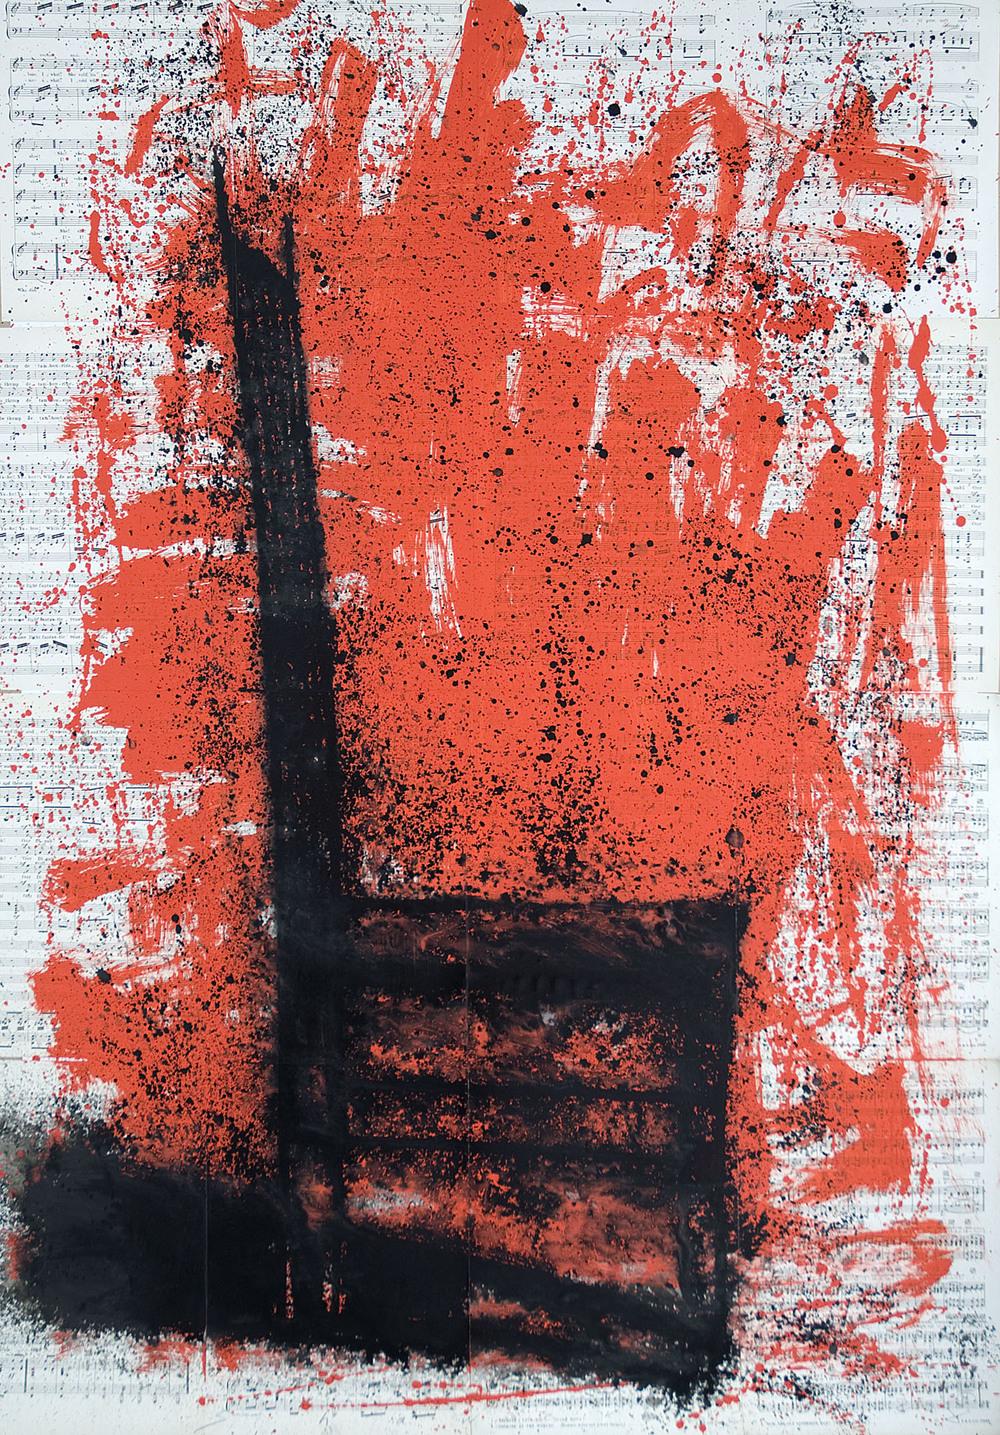 Neil Shawcross_-_#22_acrylic on paper_135 x 91.5cm.jpg